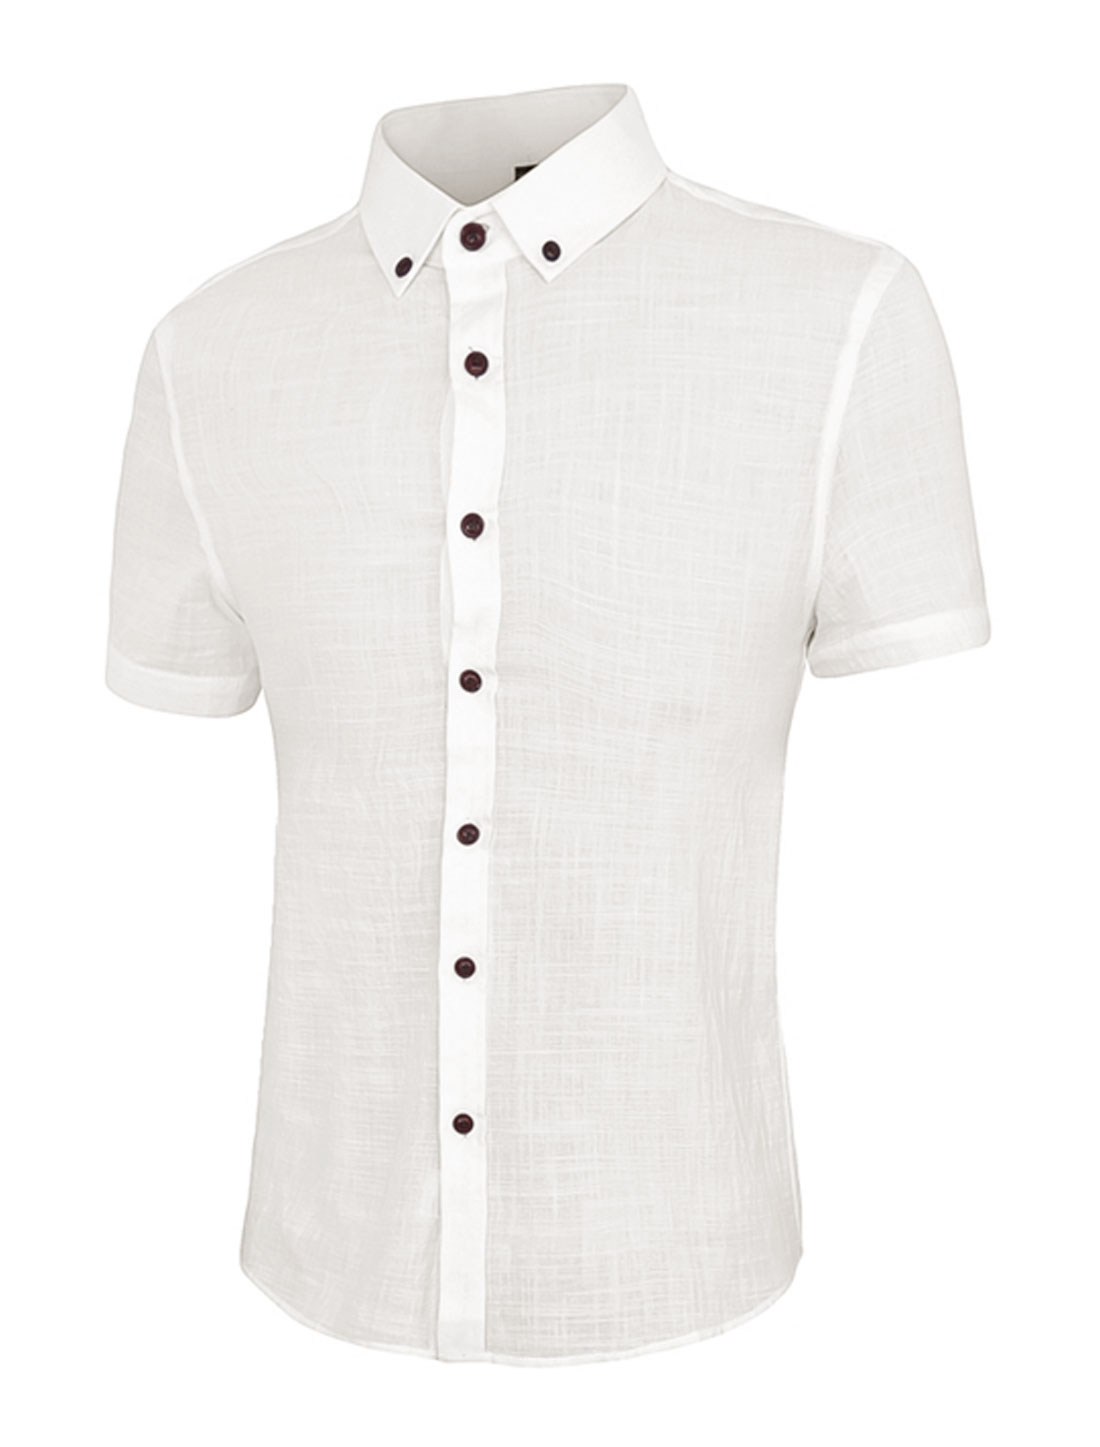 Men Point Collar Short Sleeves Slim Fit Button Down Shirt White S